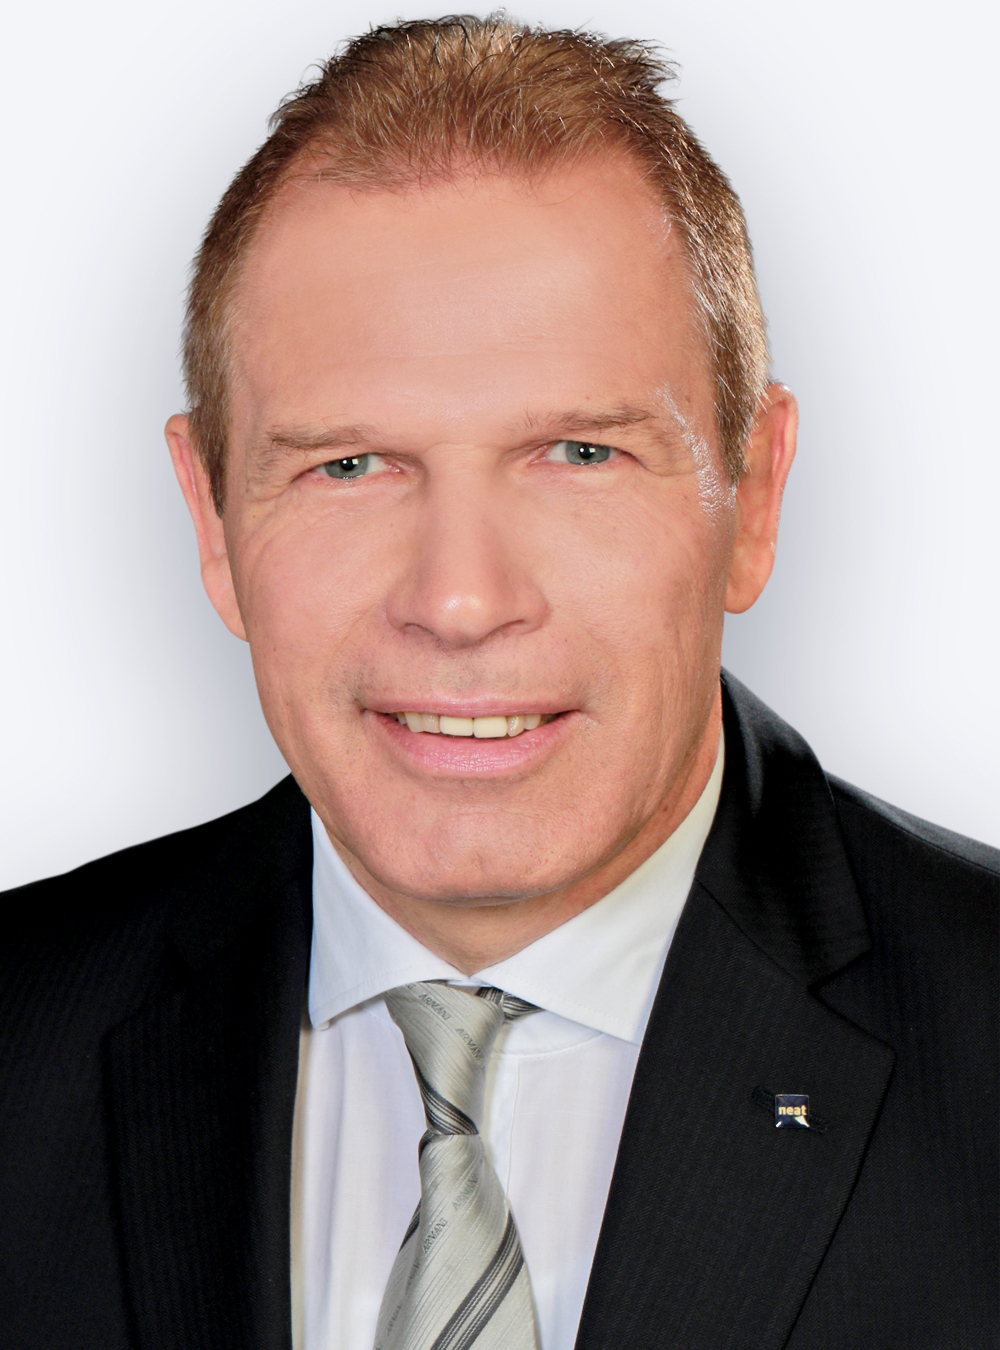 Jürgen Werdeker